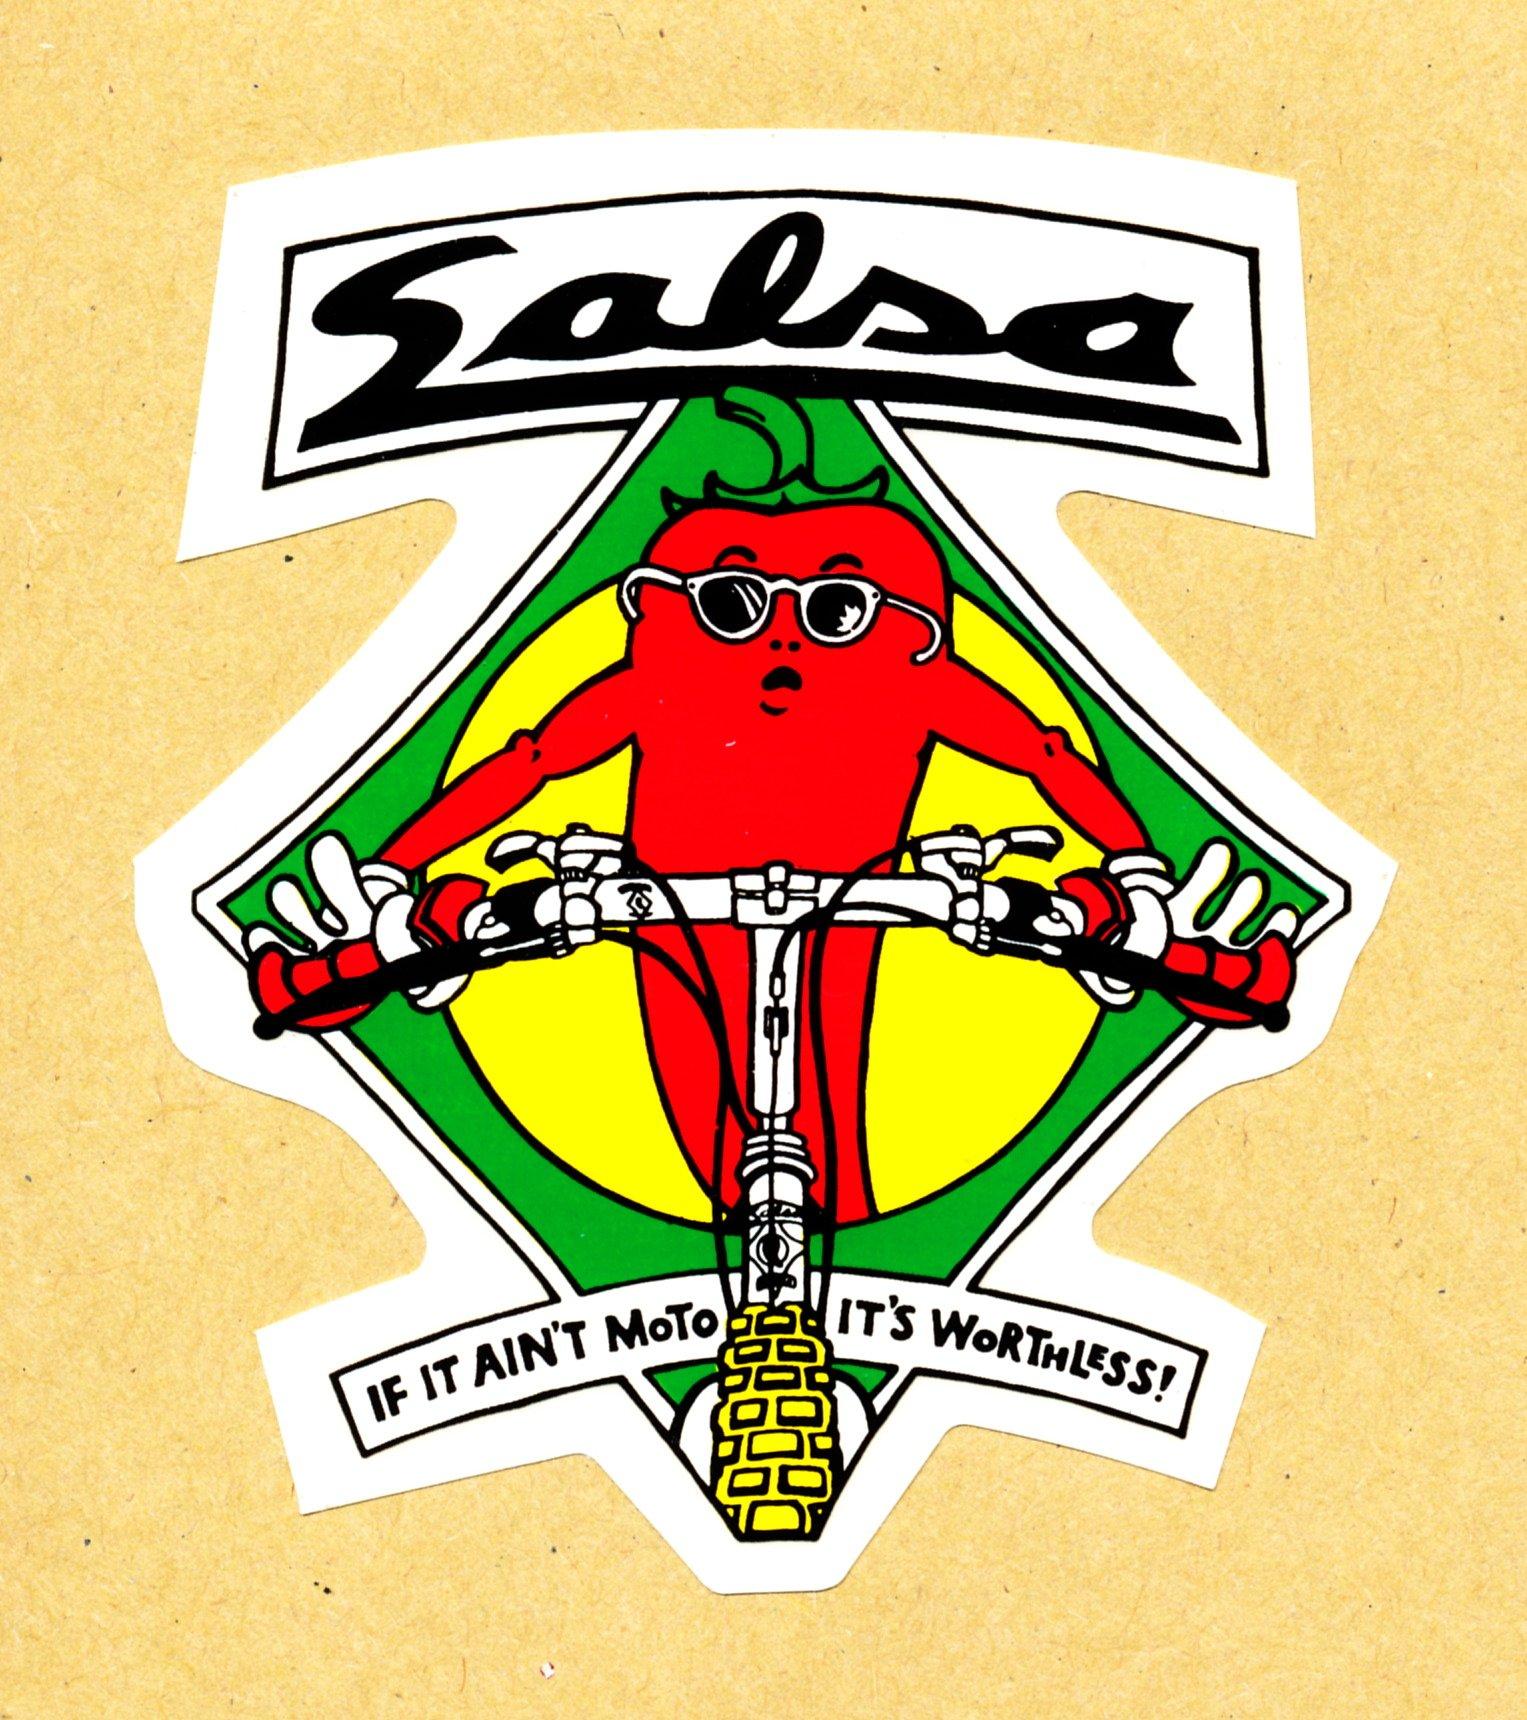 foto salsa cycles aufkleber quotif it aint moto its wo�